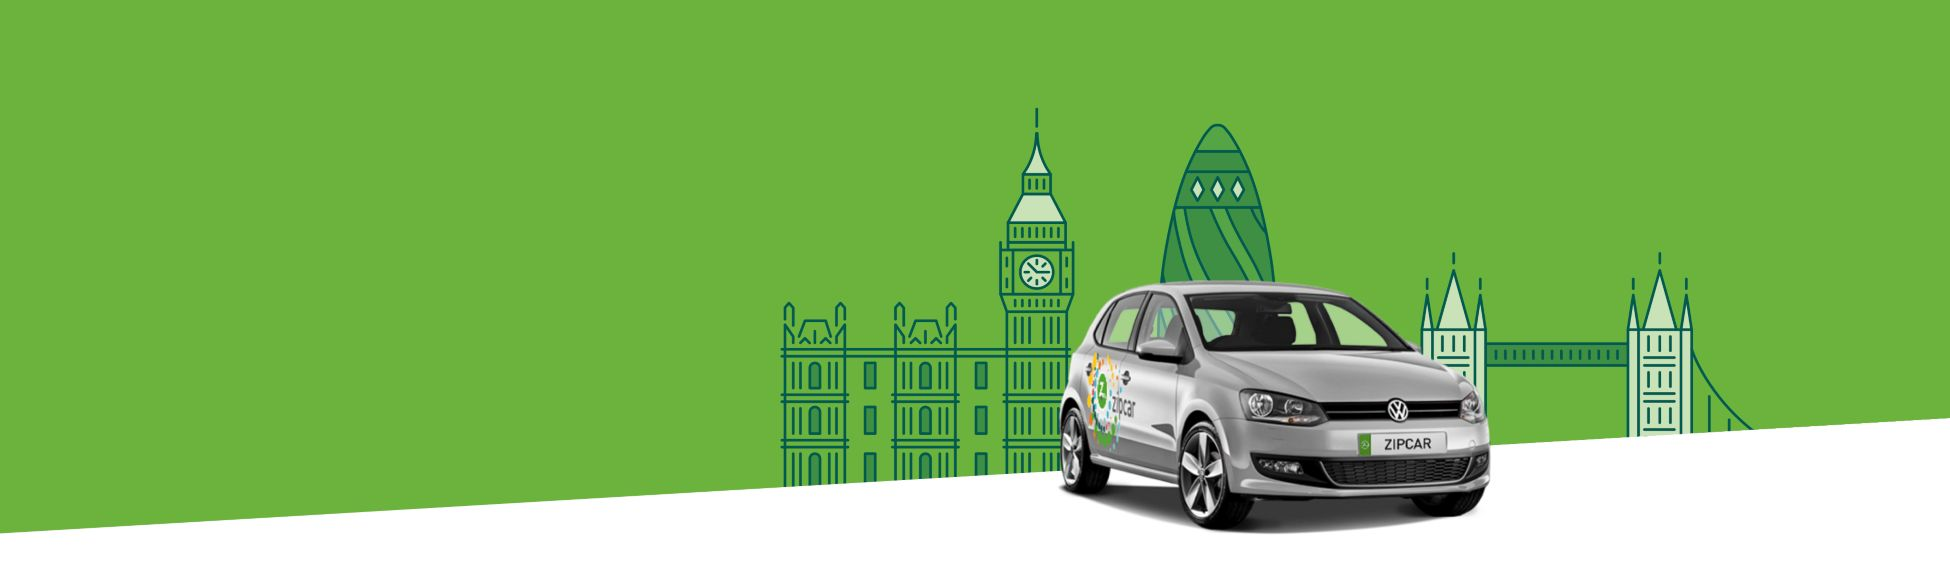 Silver zipcar flex on an animated cityscape